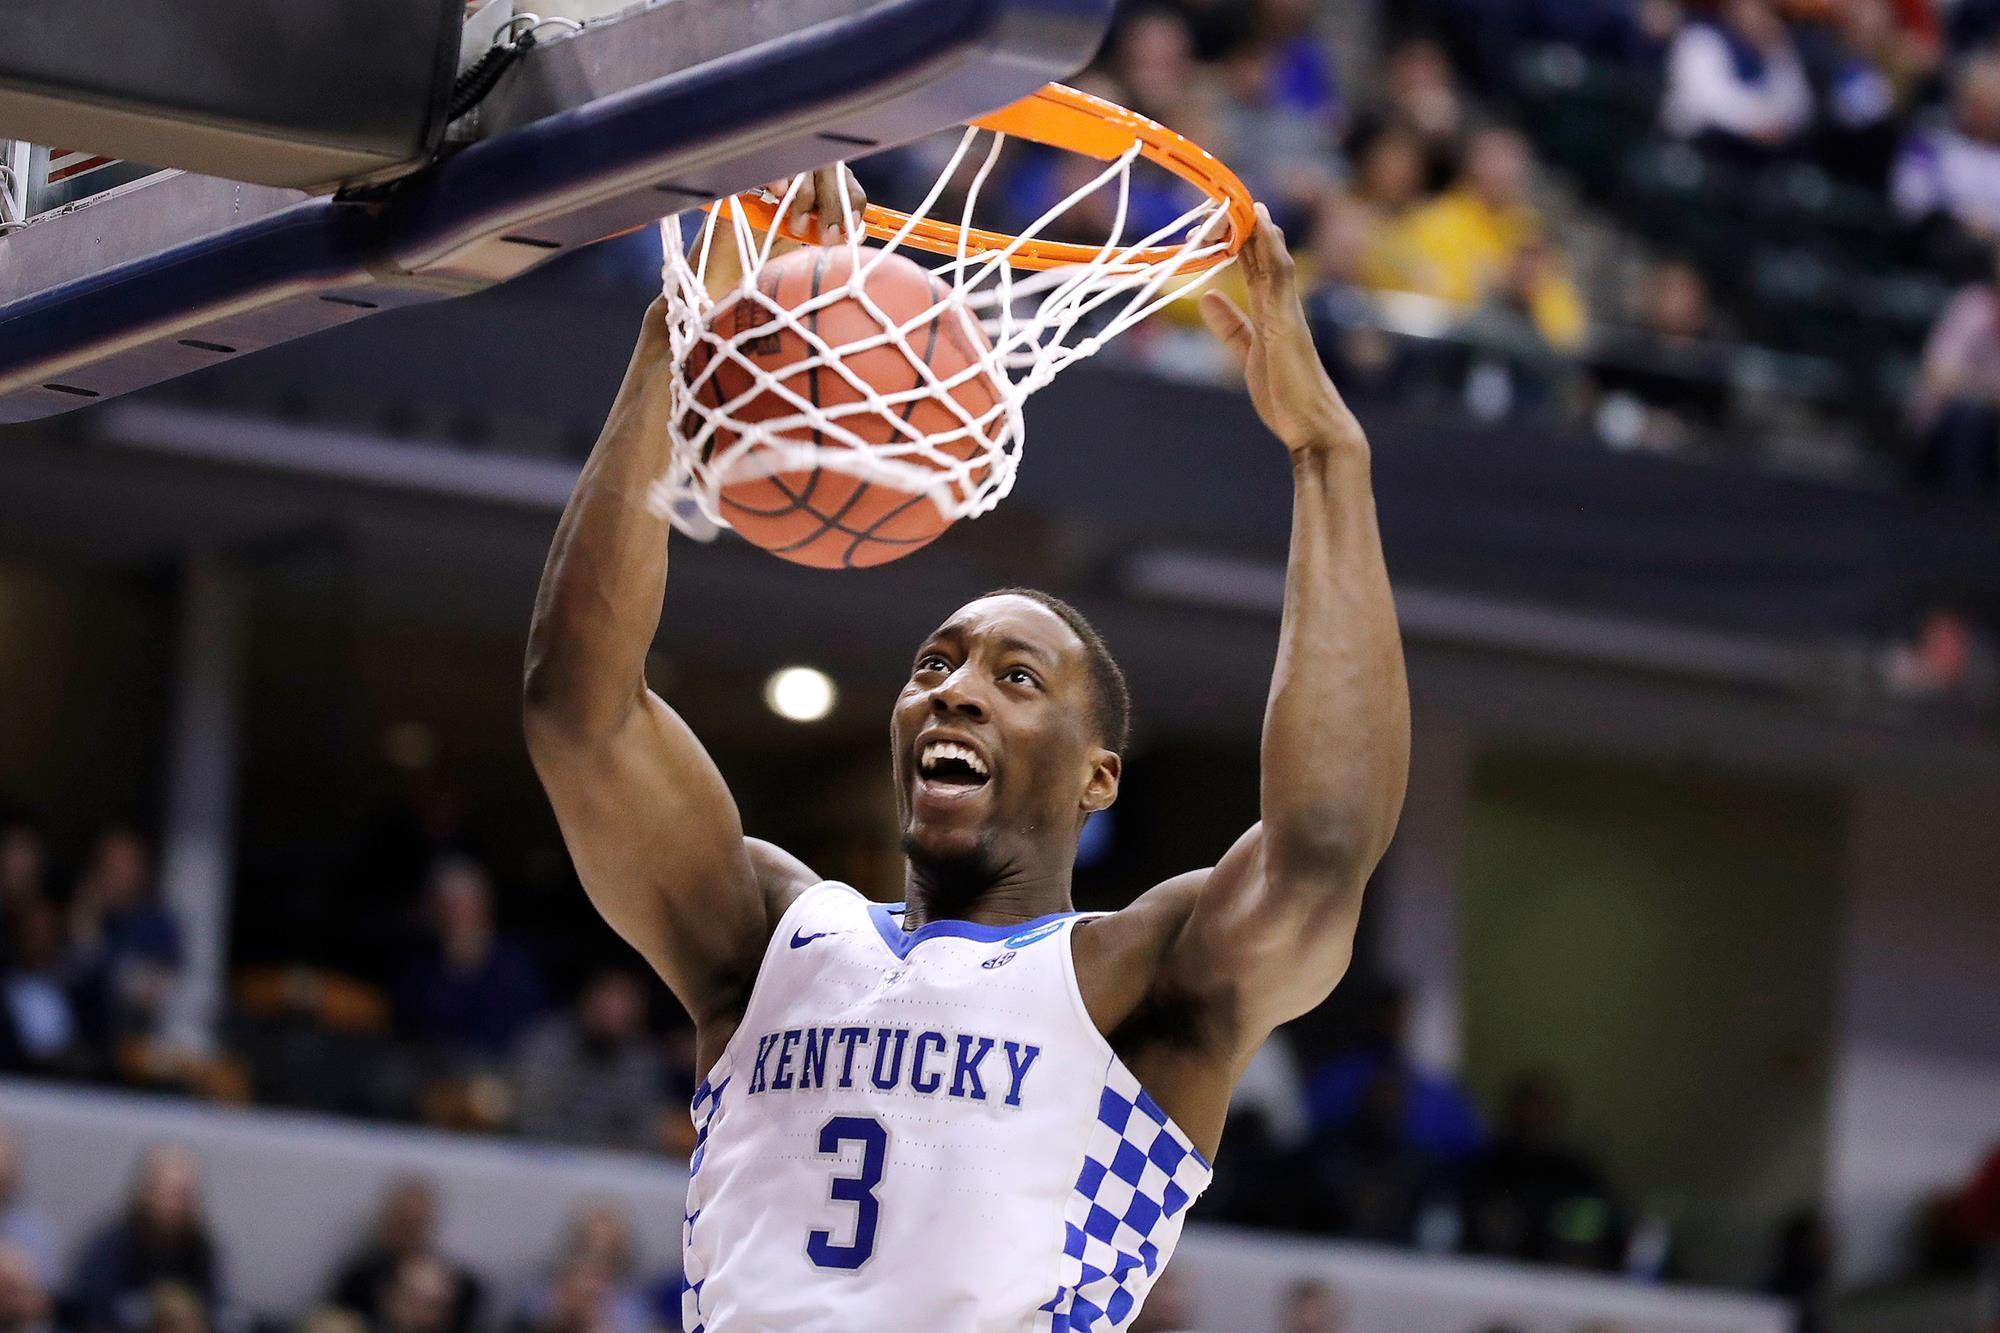 Bam Adebayo from Kentucky